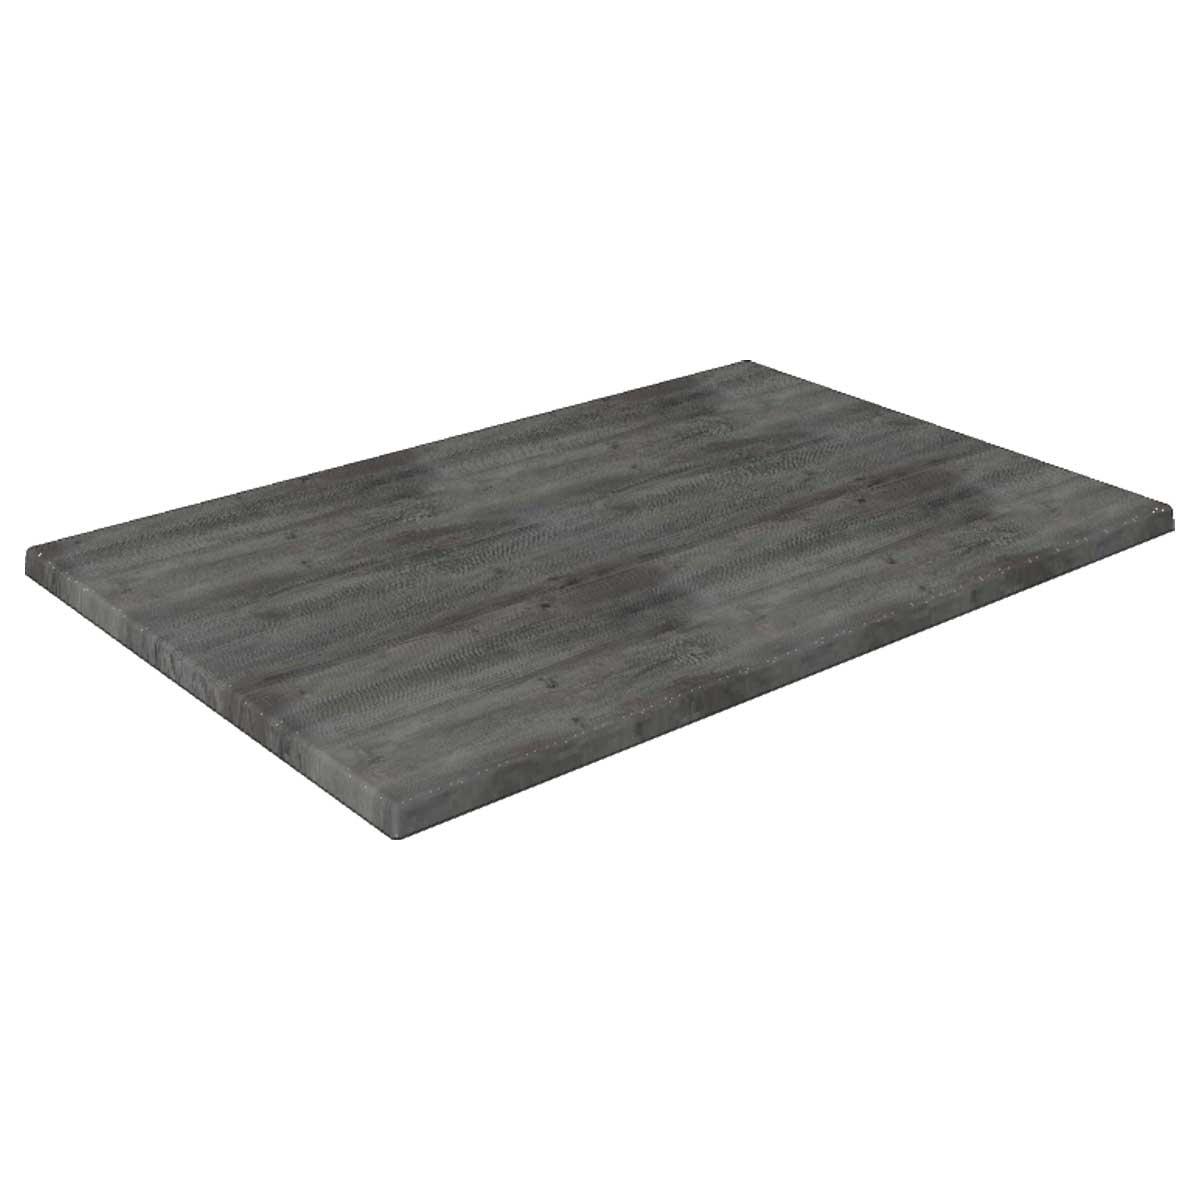 TICLA E120X80 179 - https://www.werzalit.com/fr/produit/plateau-de-table-classic-werzalit-e-80x60-179-ponderosa-grau/